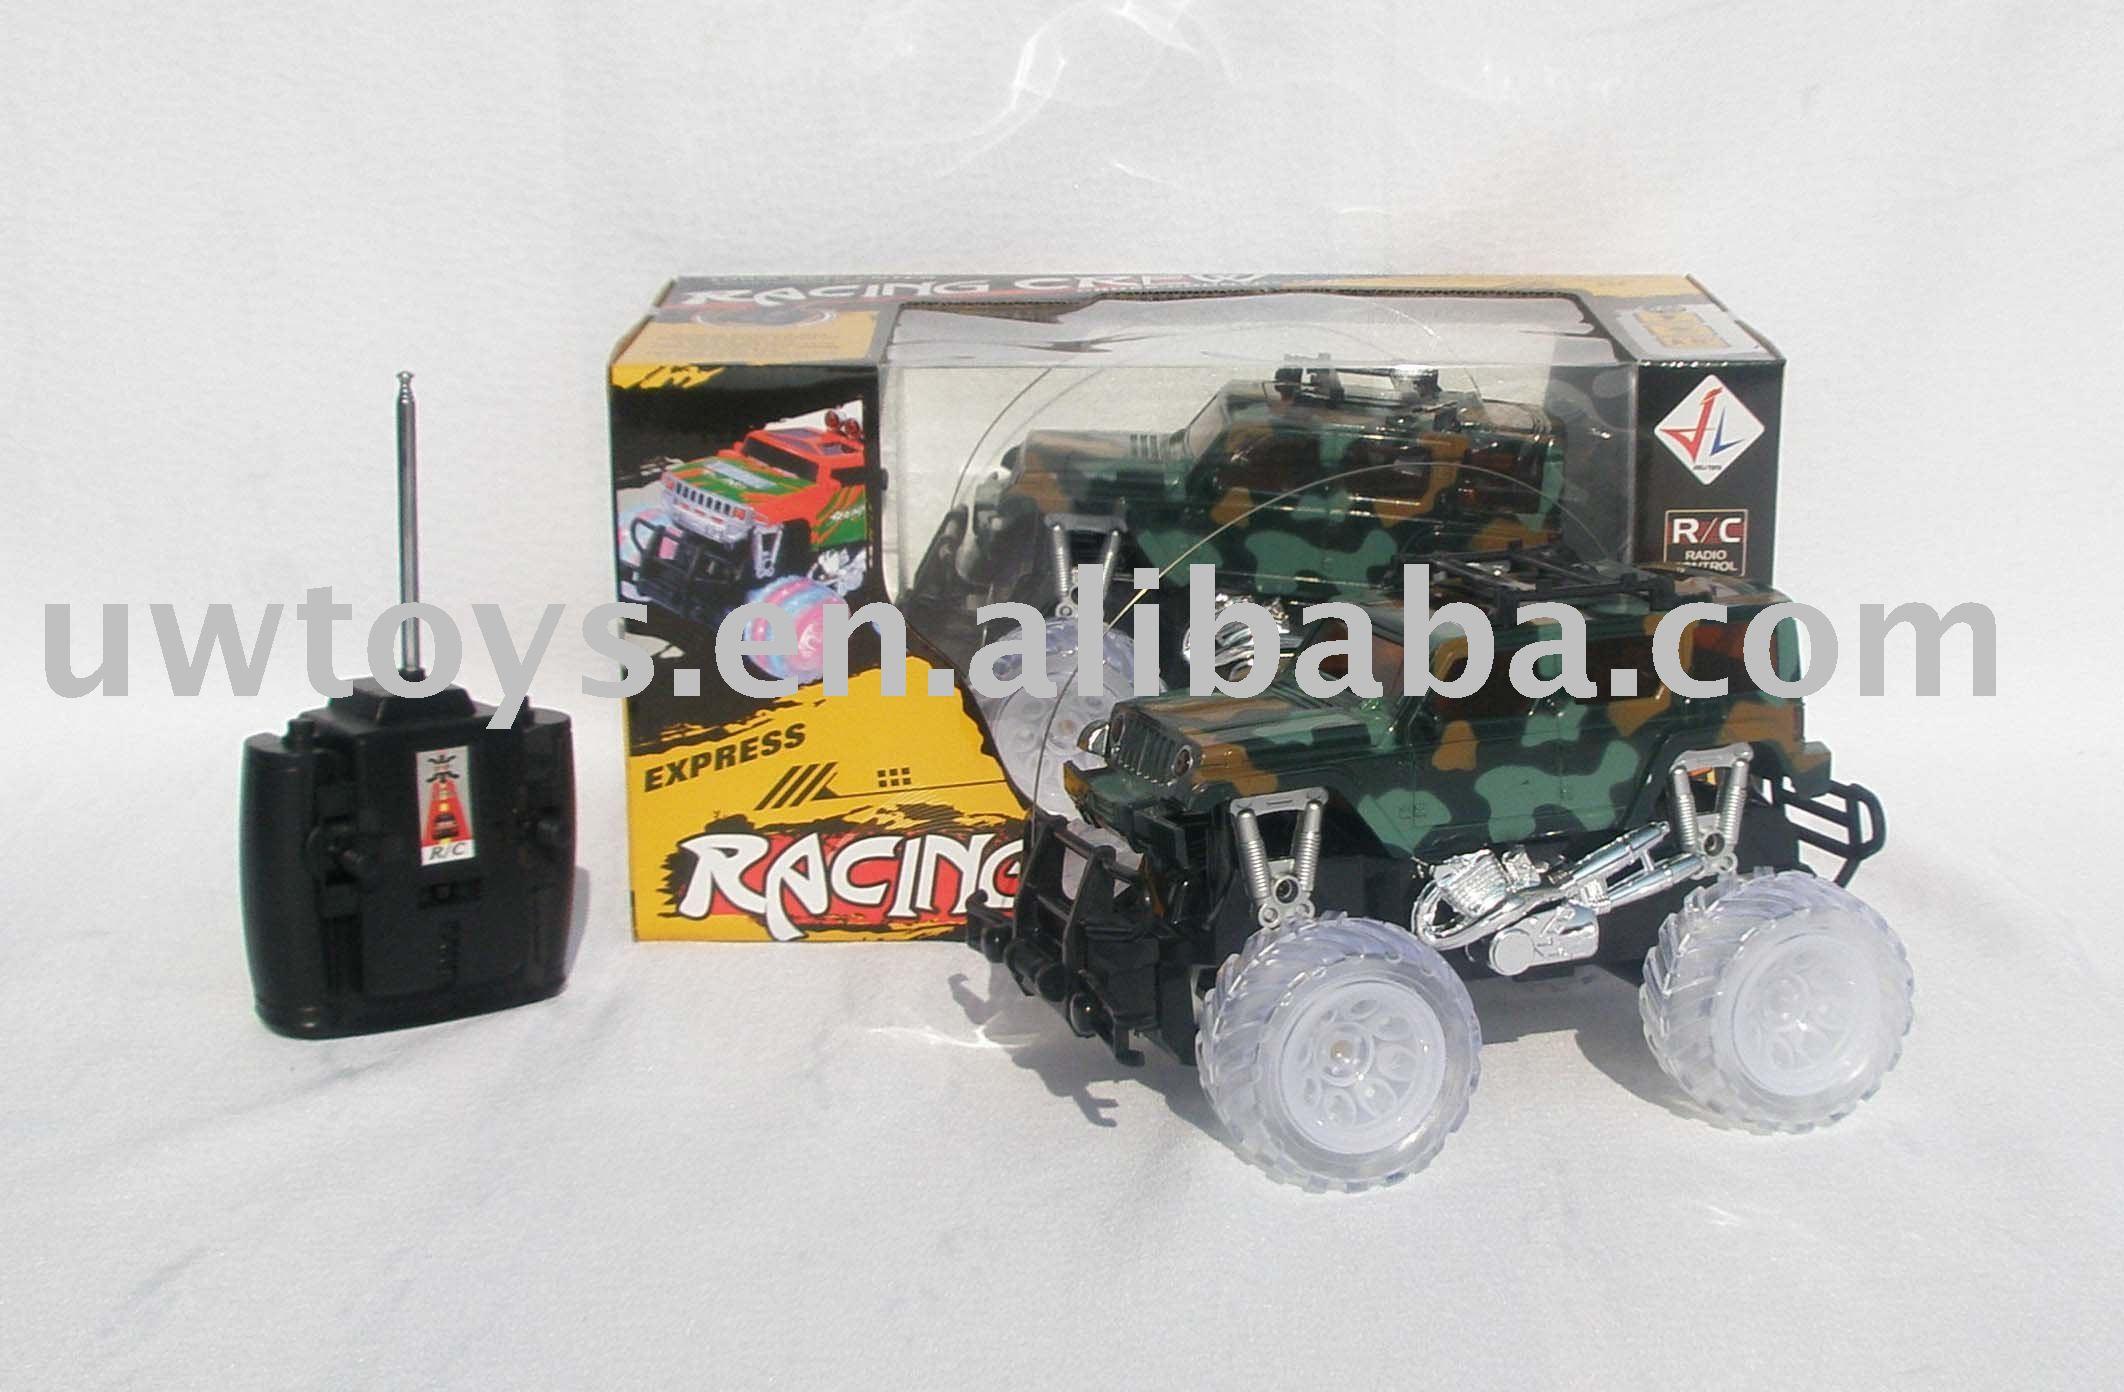 Rc car/Radio control drift